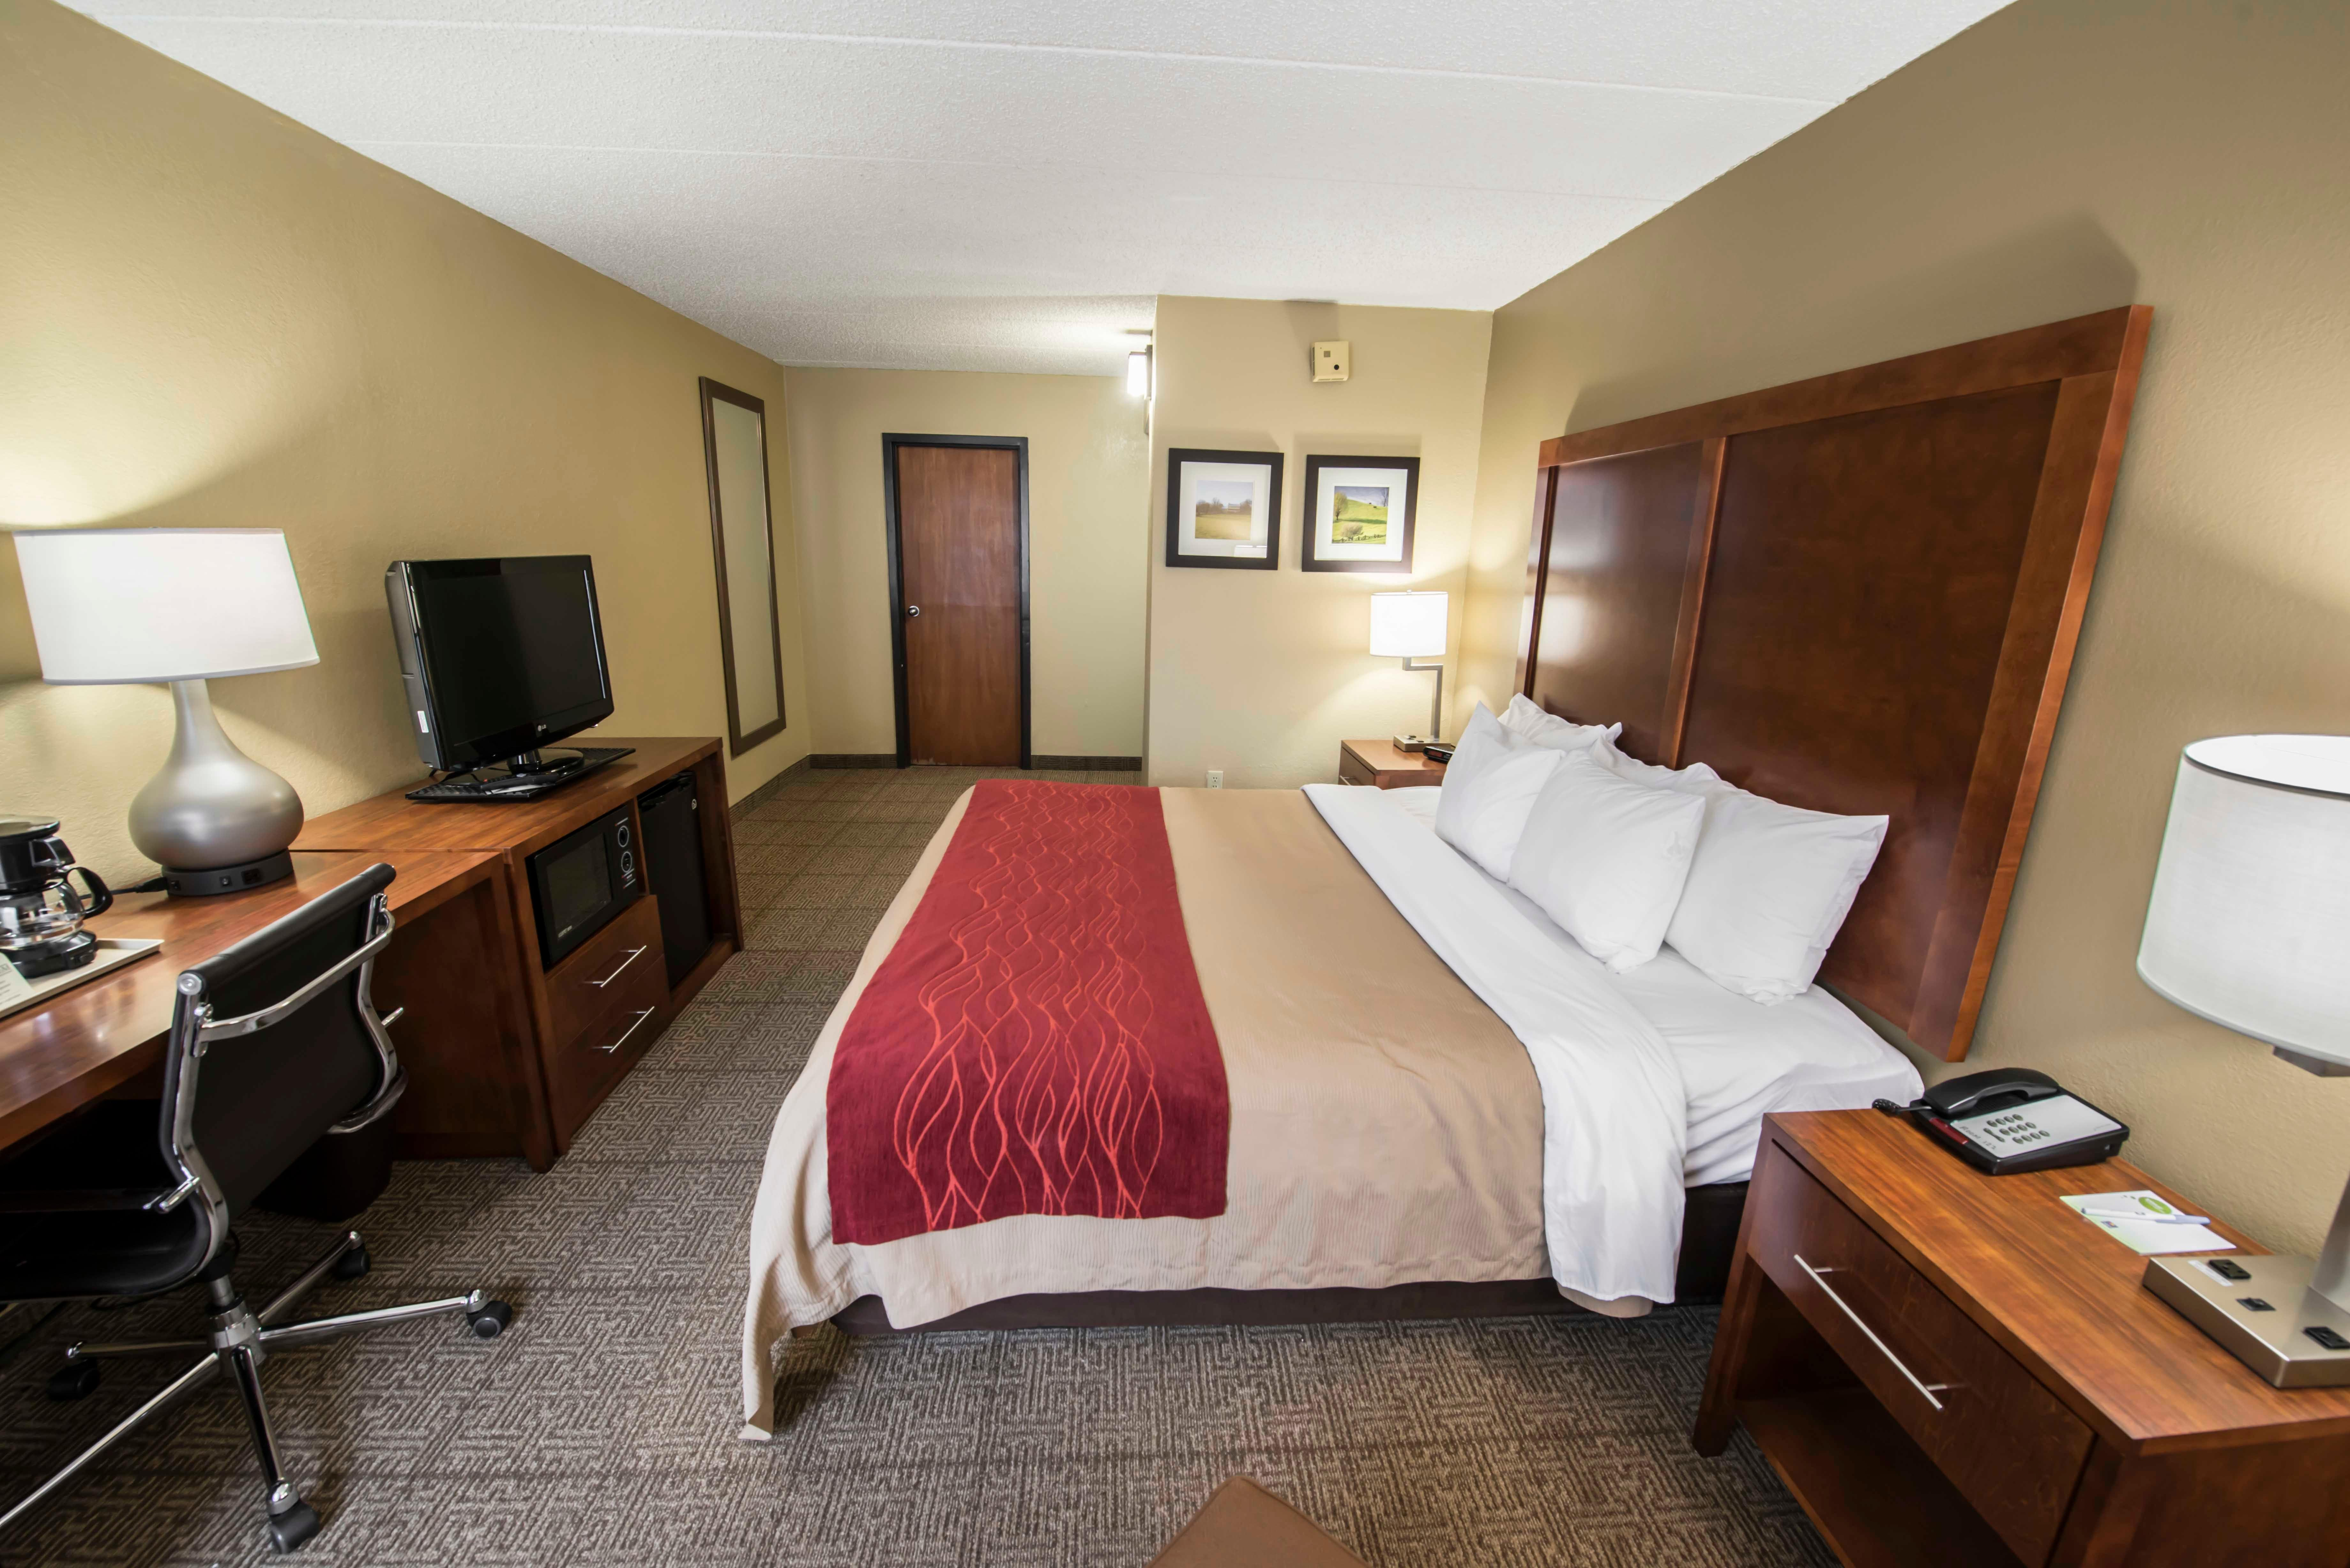 Comfort Inn Wytheville, Wytheville VA